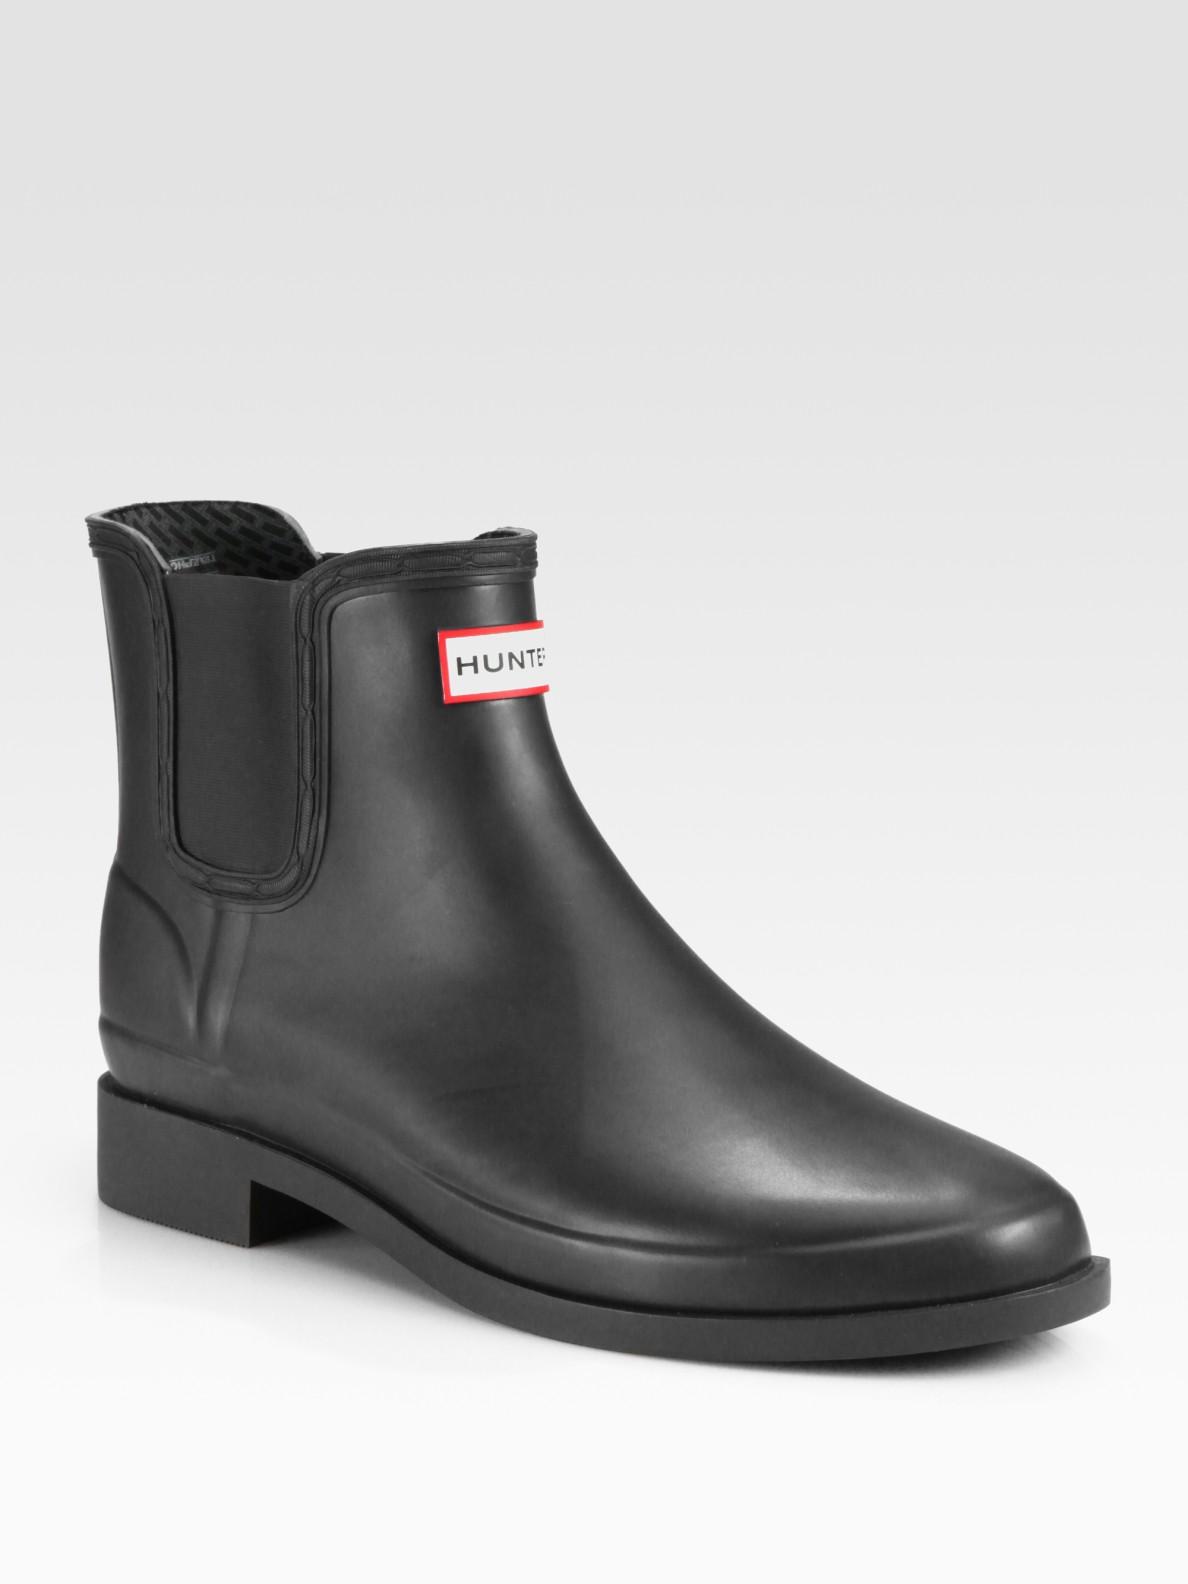 hunter chet rubber chelsea boot in black for men lyst. Black Bedroom Furniture Sets. Home Design Ideas